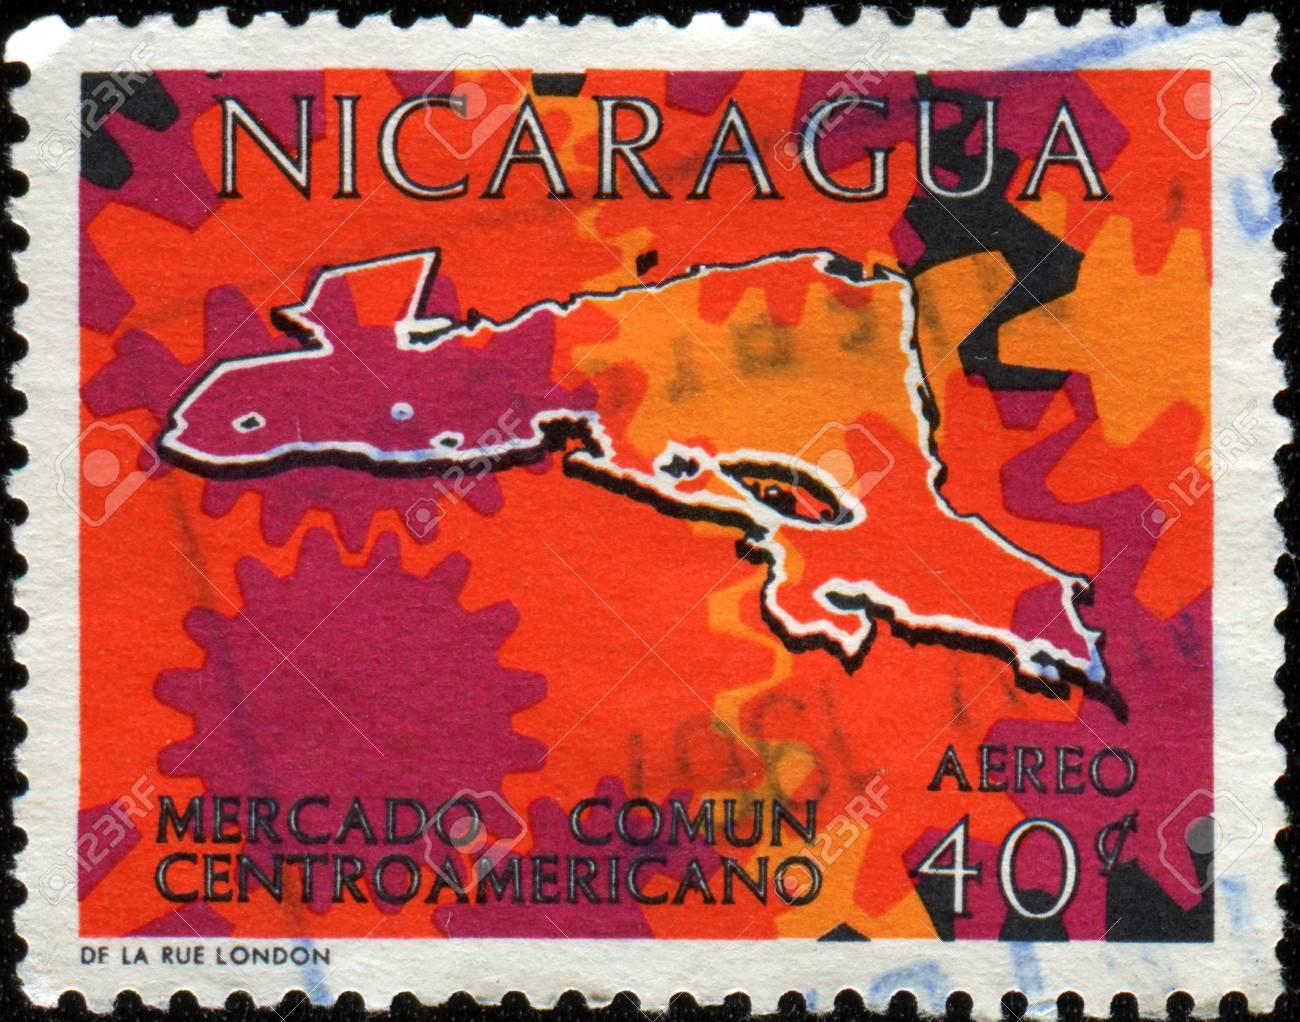 NICARAGUA - CIRCA 1964  A stamp printed in Nicaragua shows Central American, Common Market,  Cogwheels Air, circa 1964 Stock Photo - 14198121